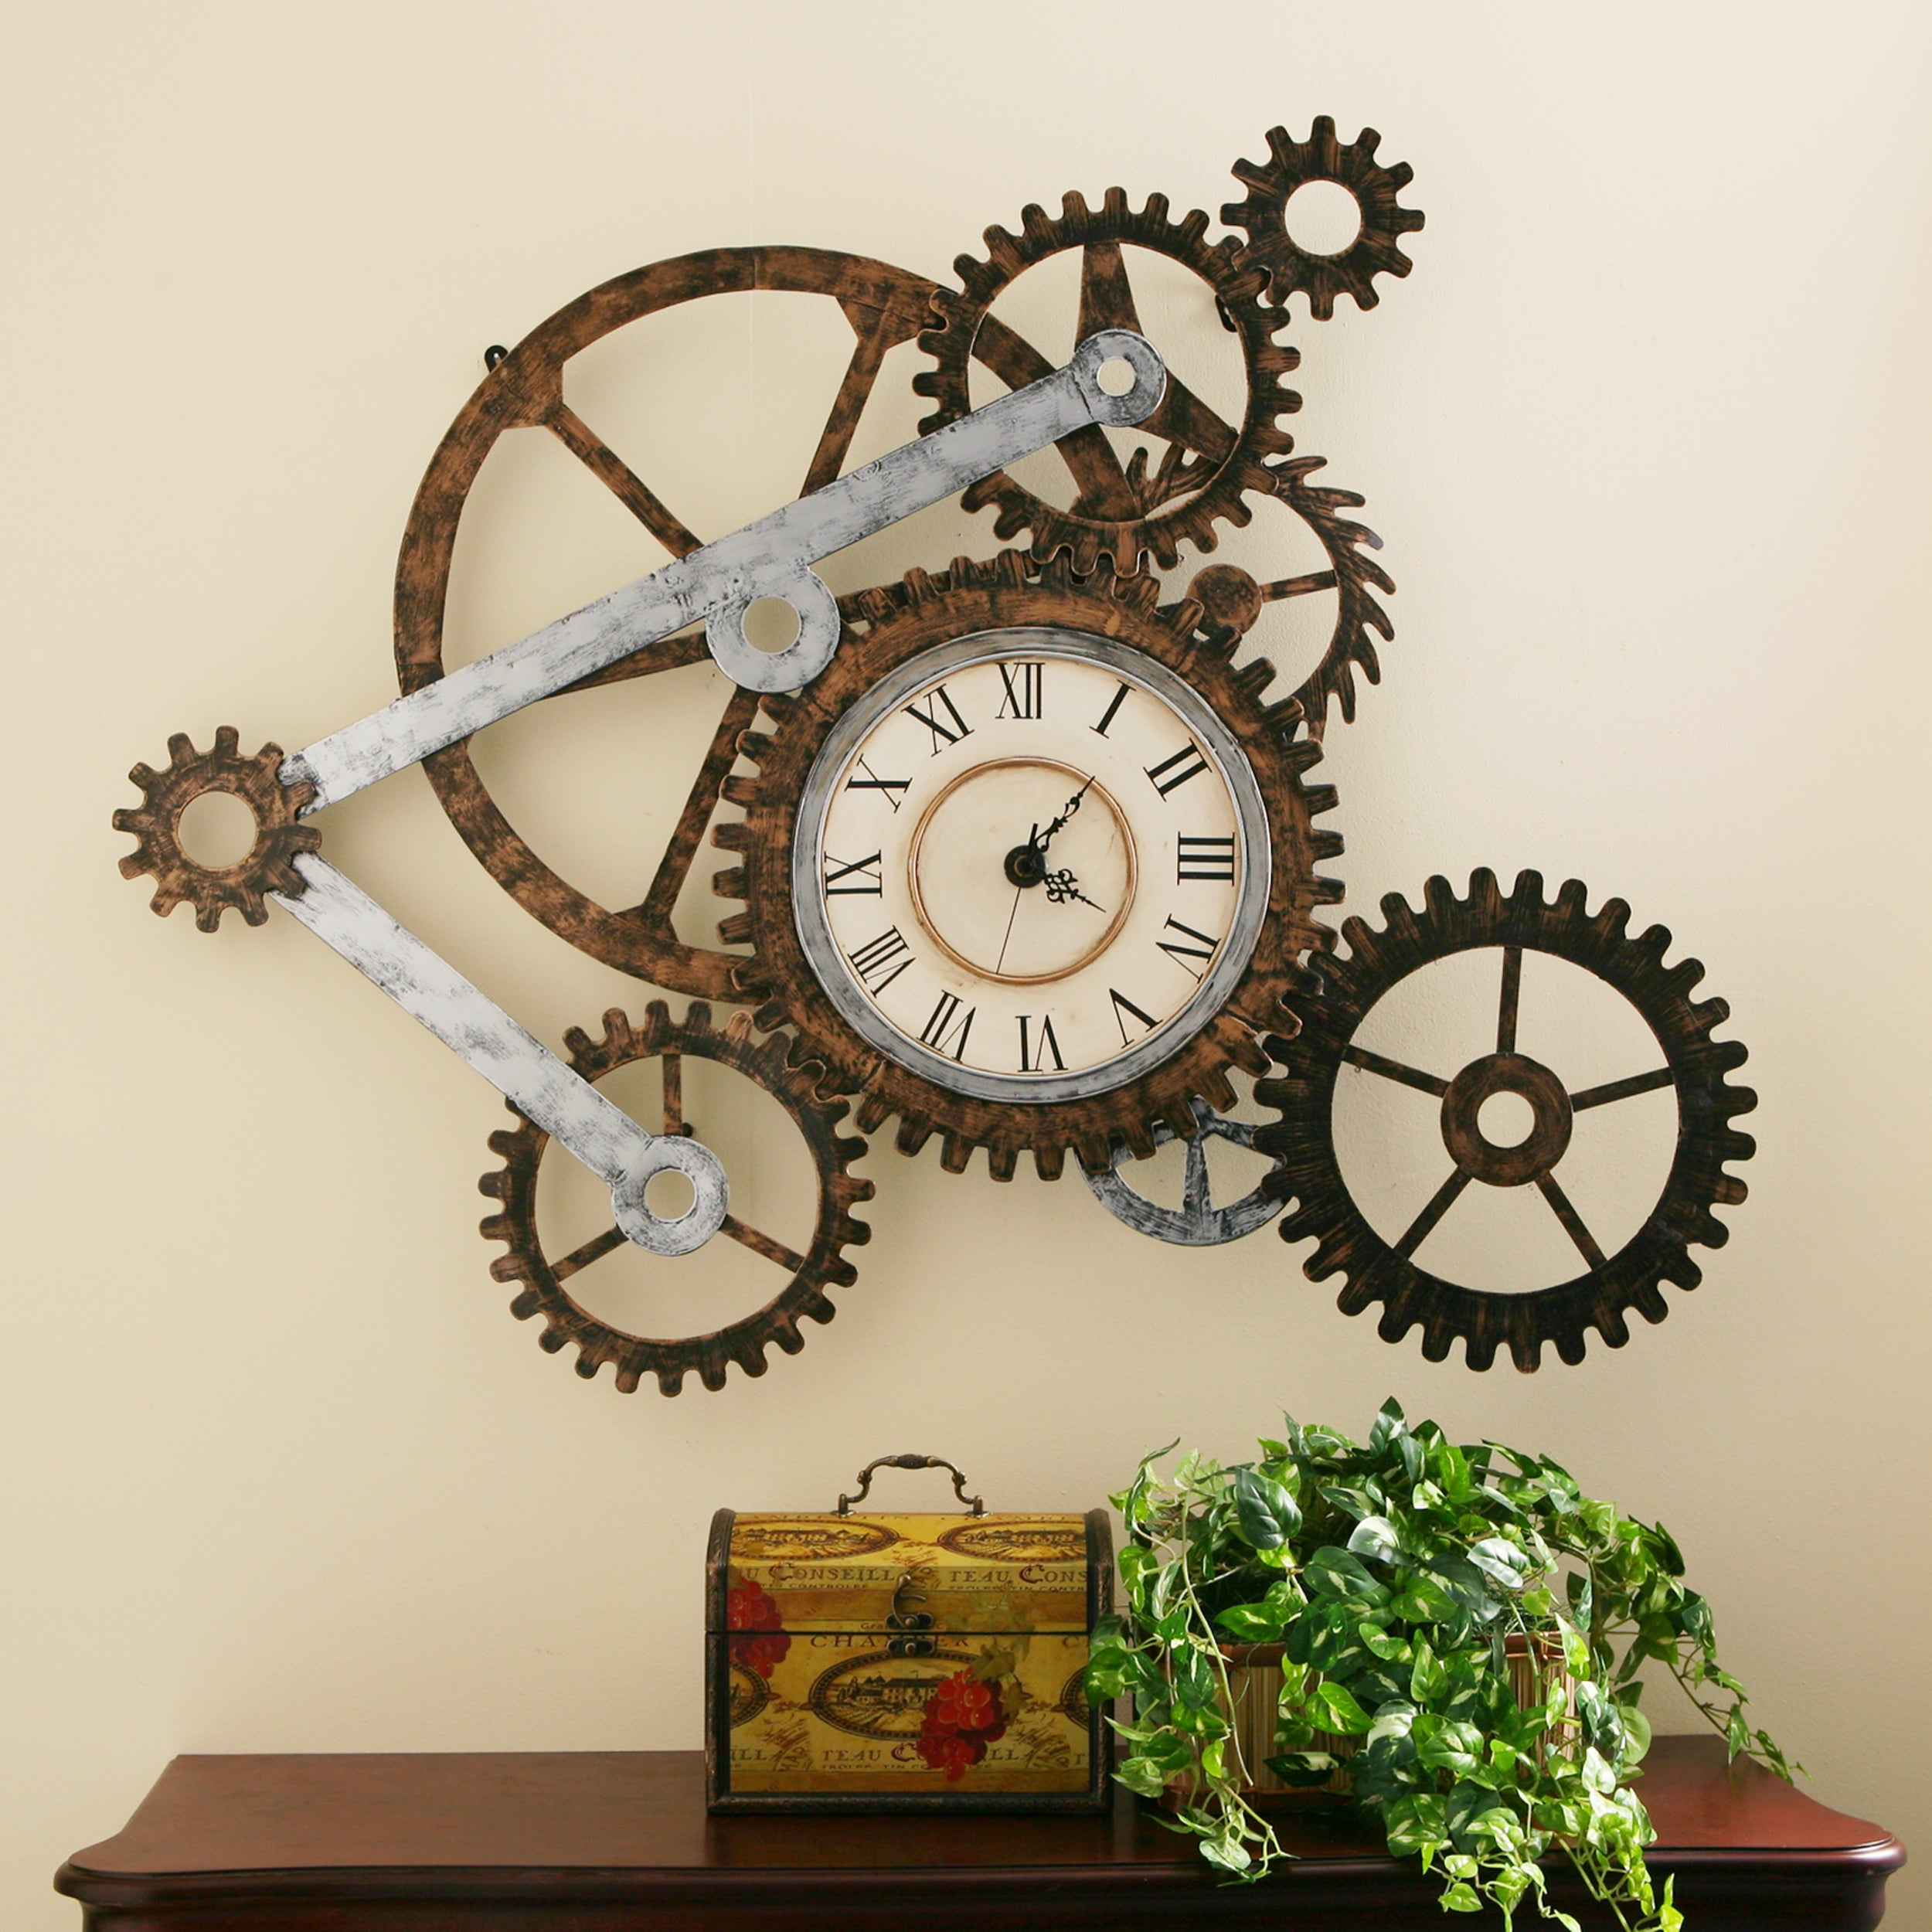 Industrial Gear Clock Gears Wall Art Rustic Farmhouse Metal Steam Punk Style